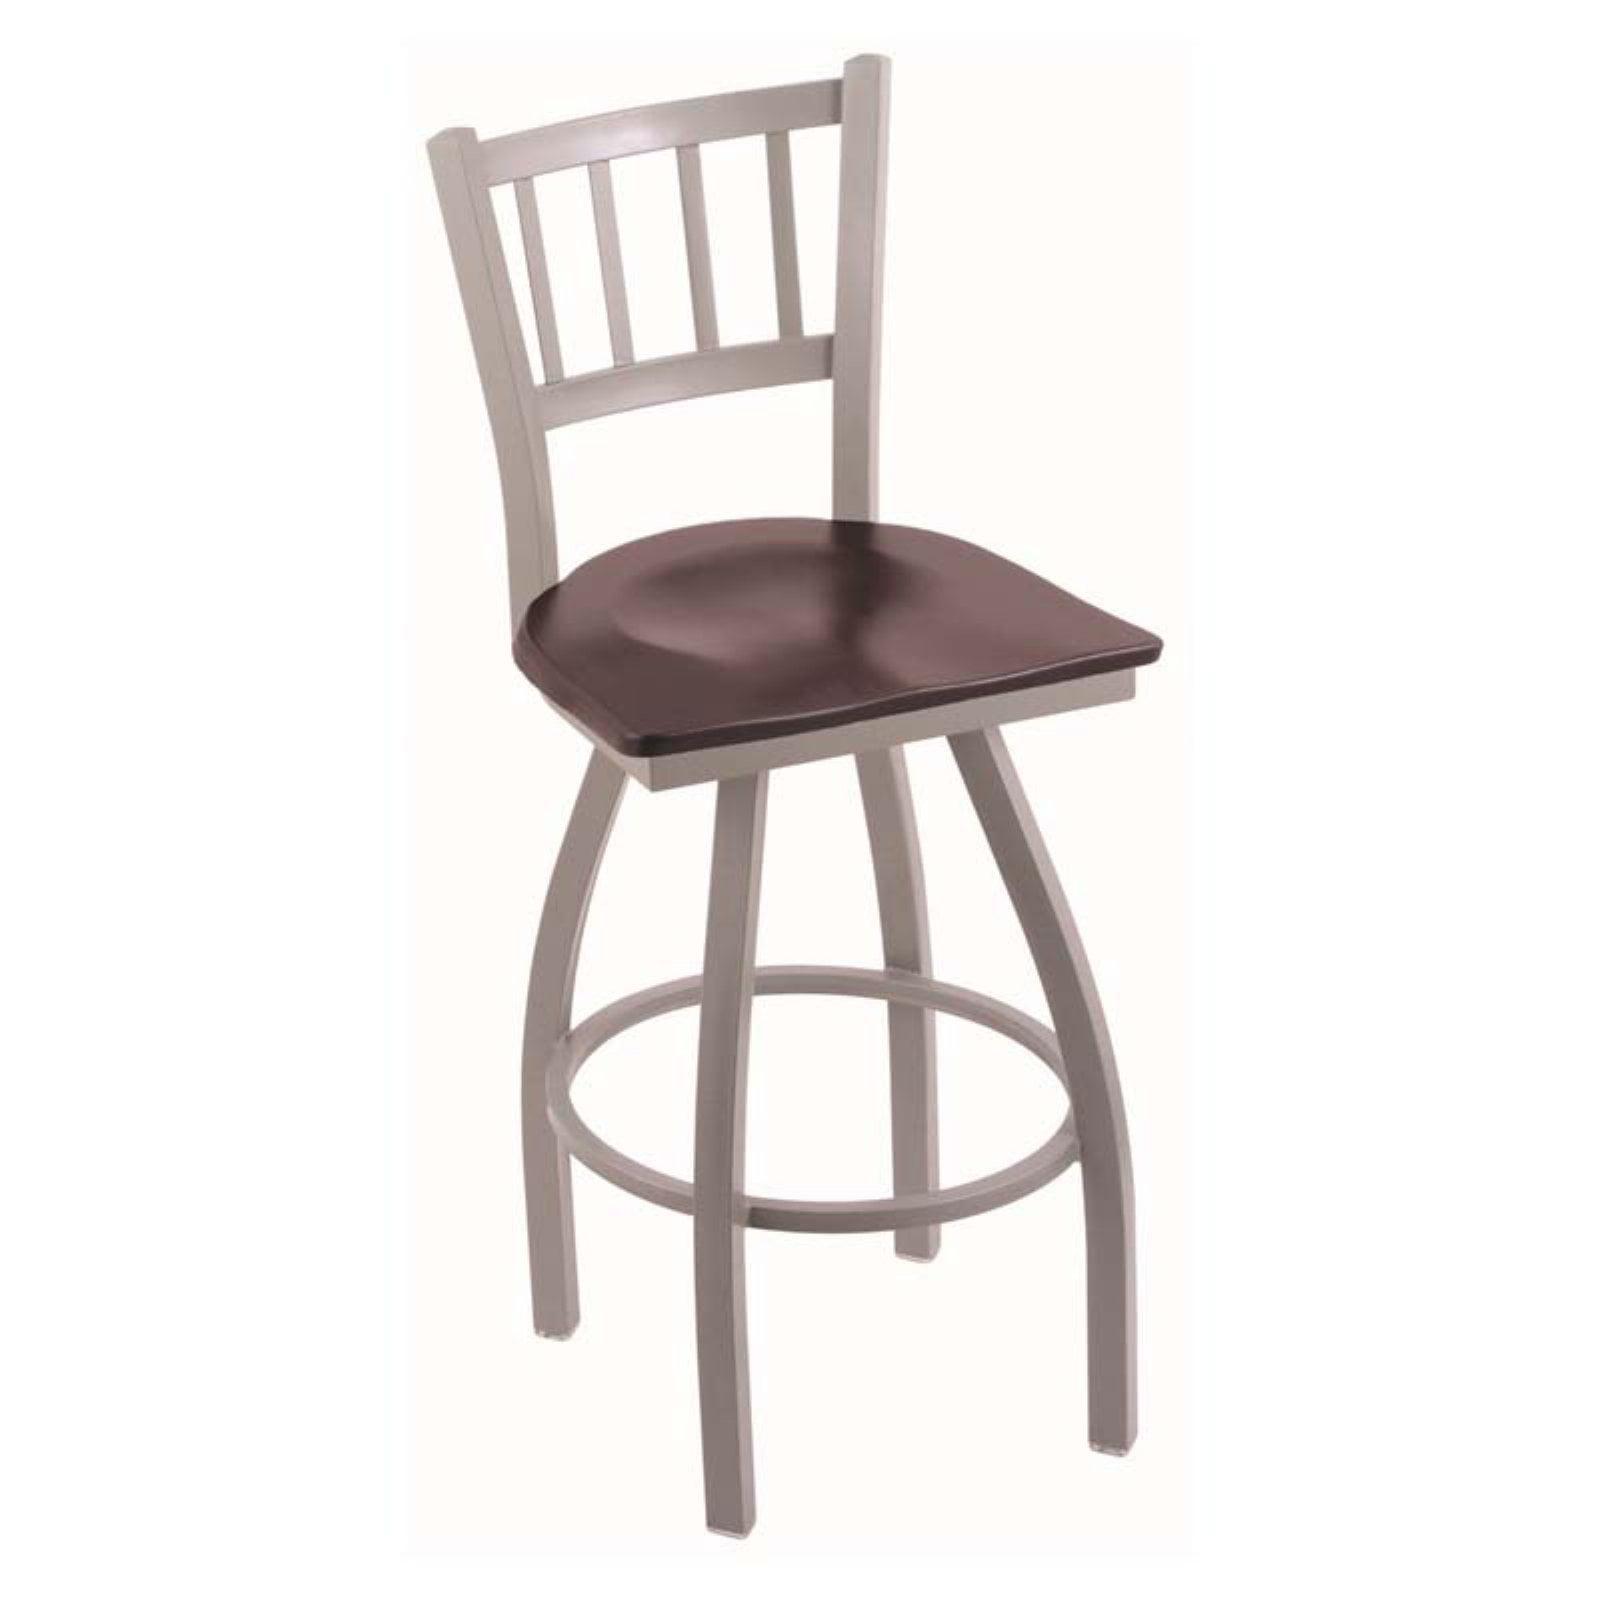 Holland Bar Stool Contessa 30 in. Swivel Bar Stool with Wood Seat